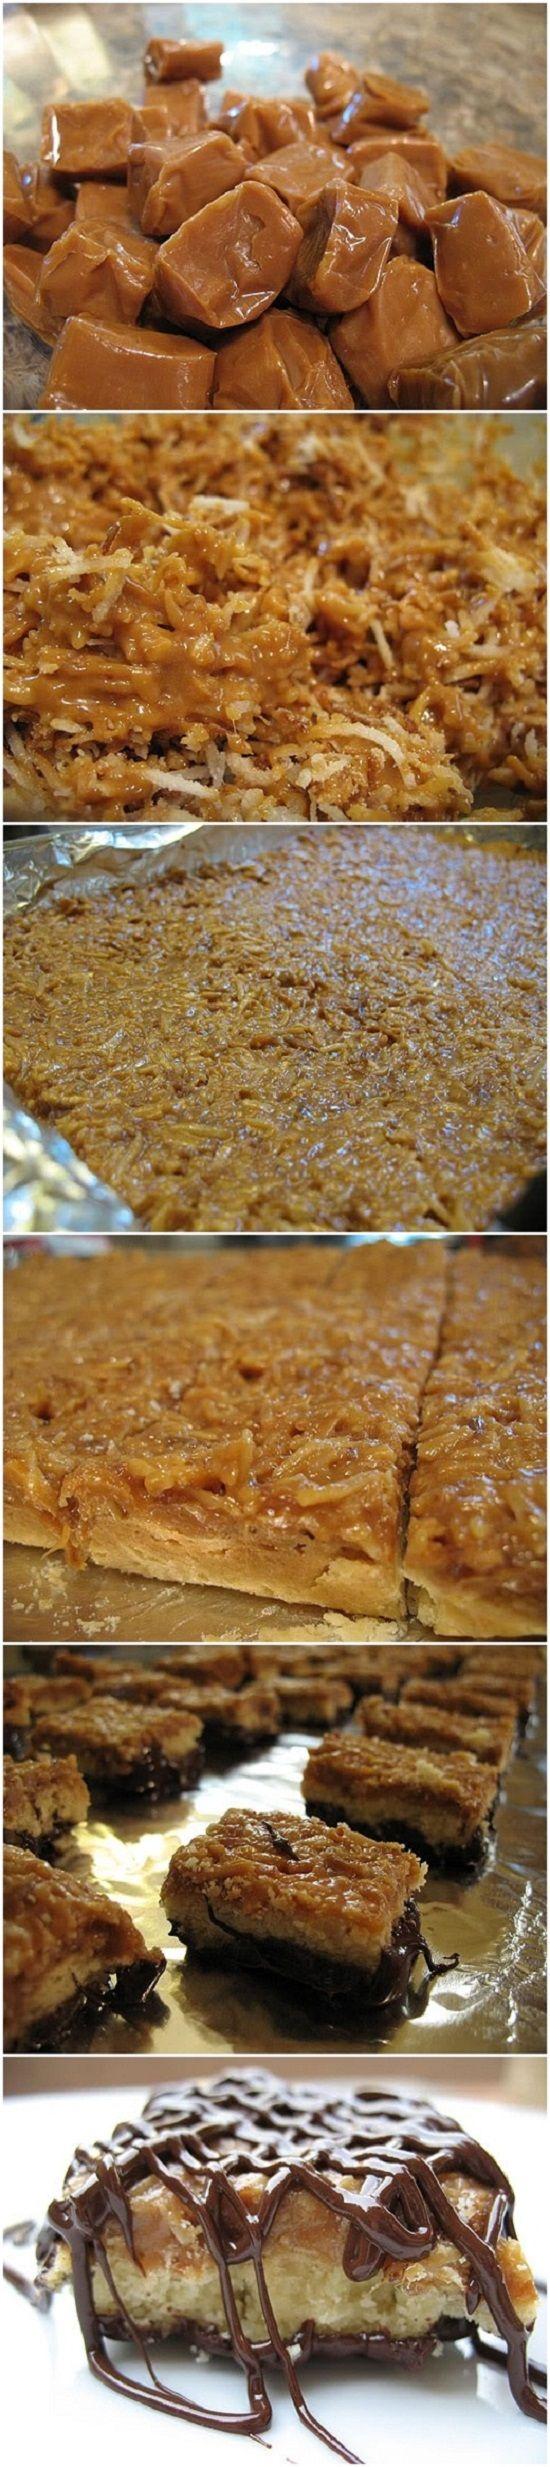 Homemade Samoas Cookie Bars | COOKIES AND BARS | Pinterest